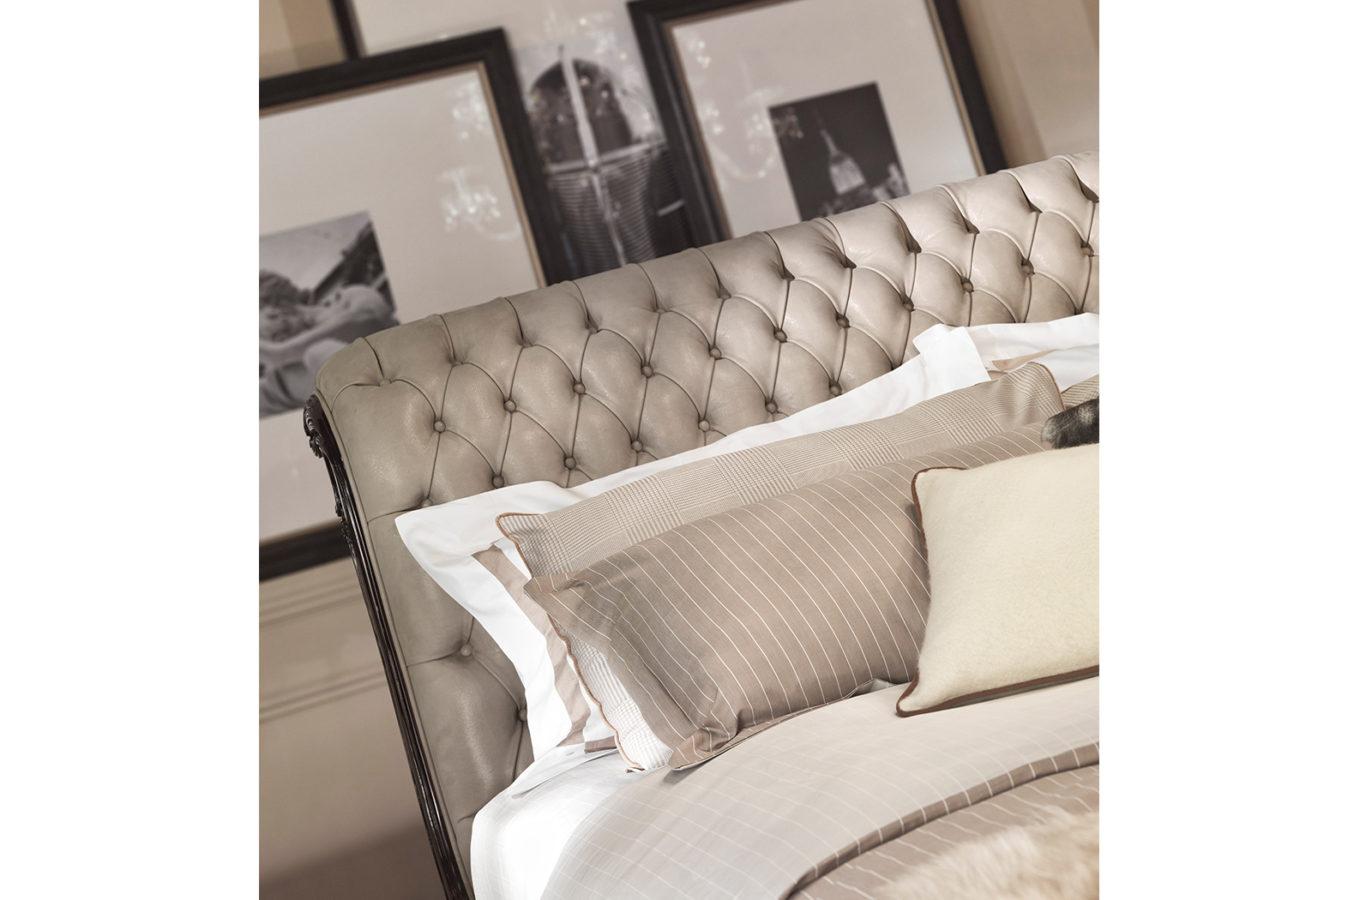 Gianfranco Ferre Home Allister Bed 03